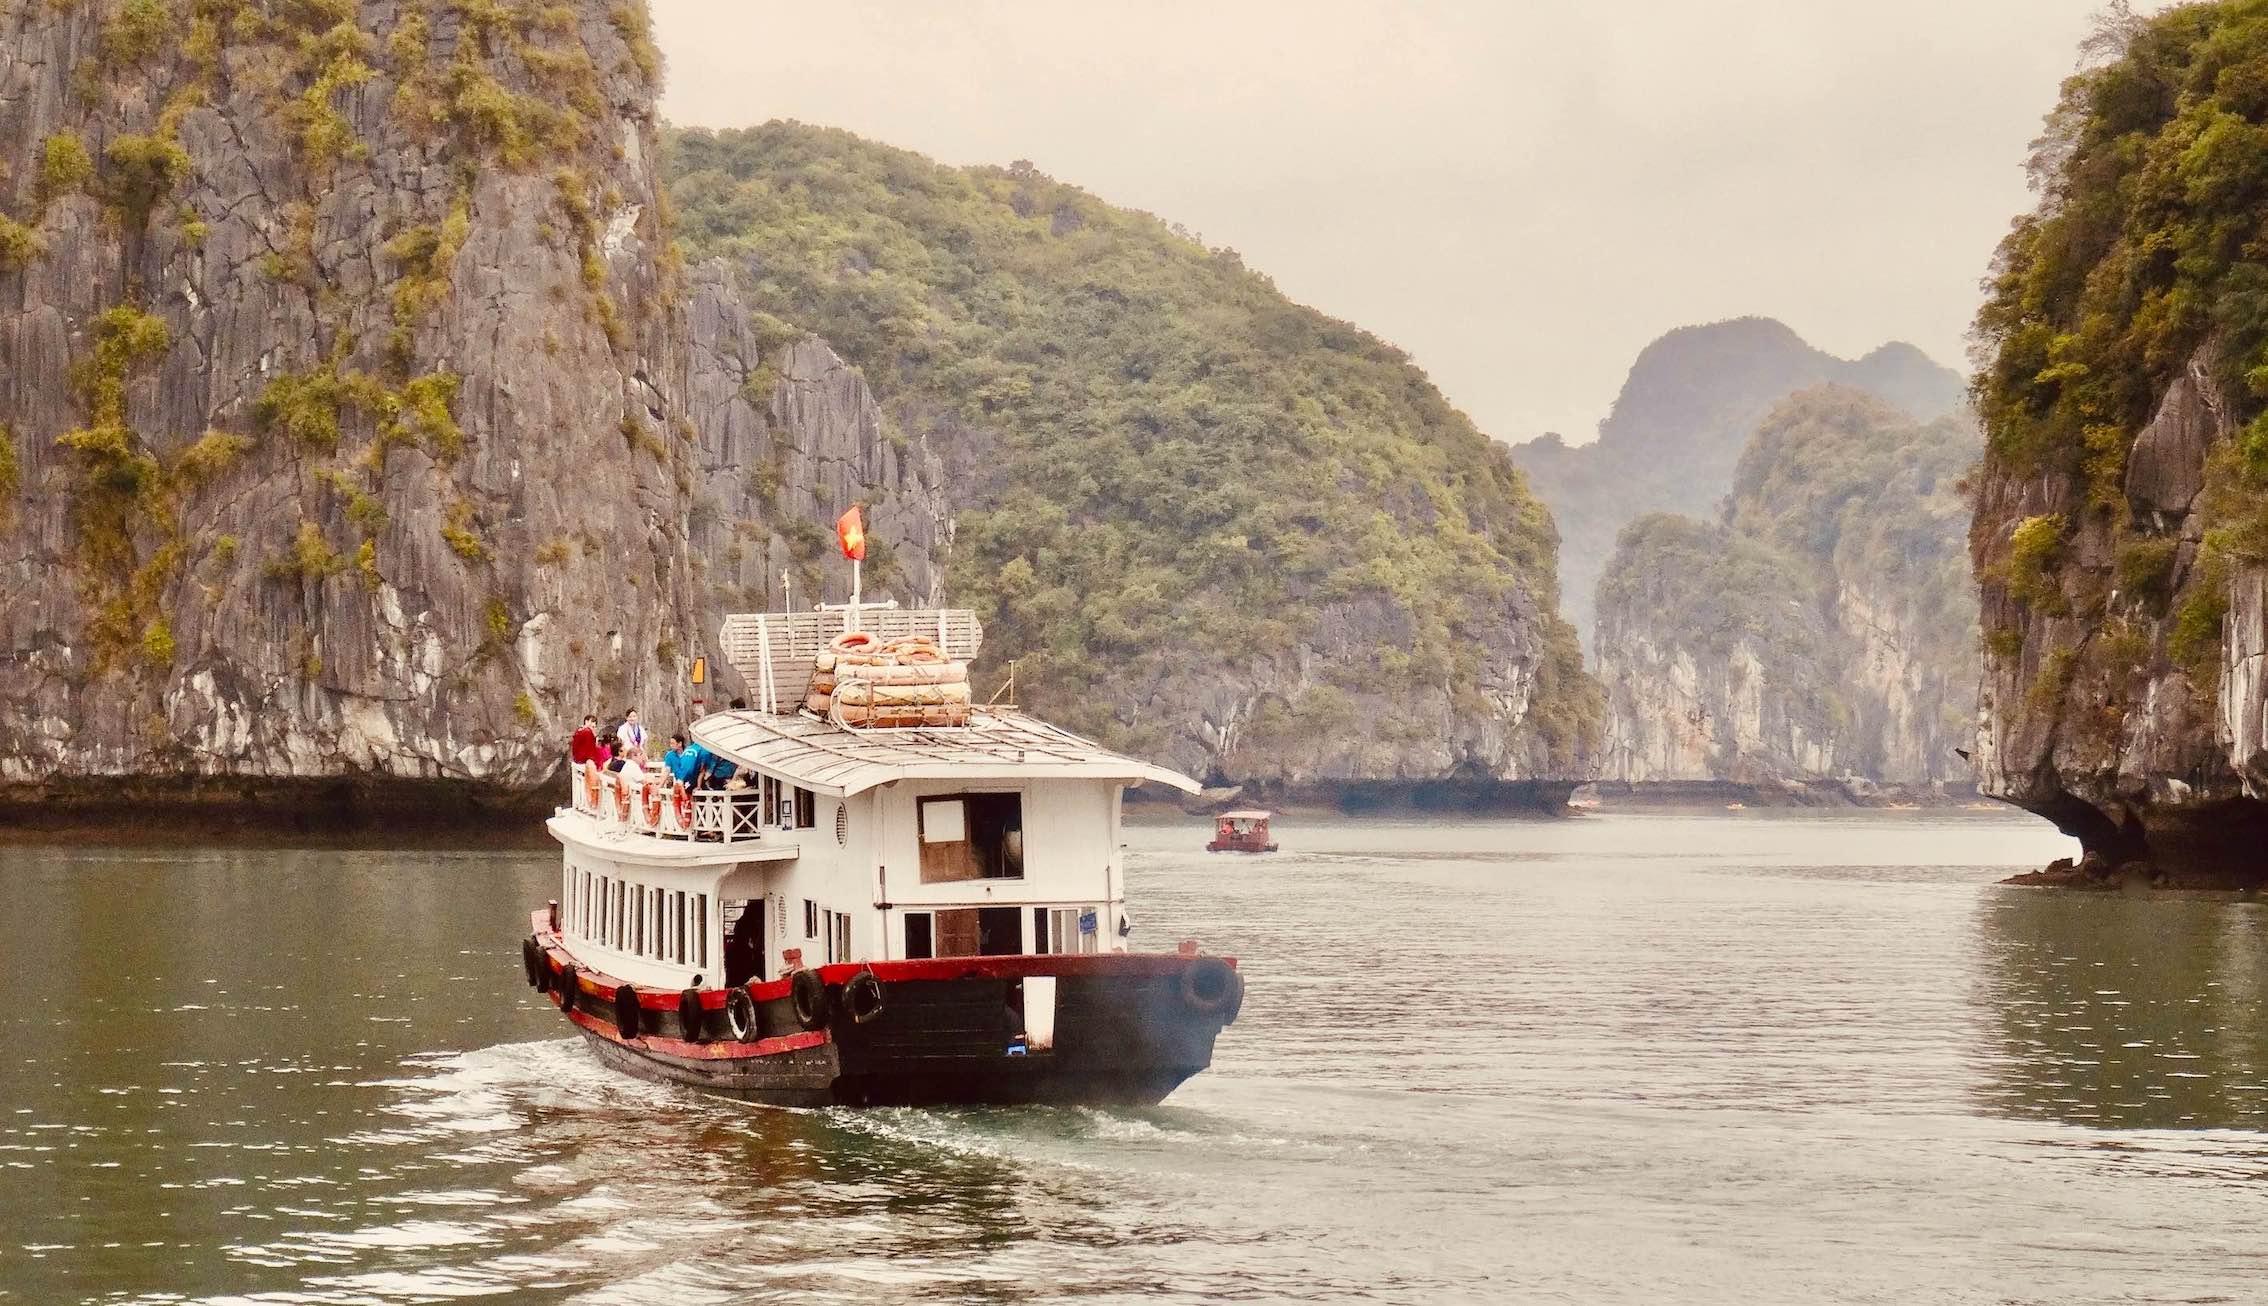 Cruising through Vietnam's beautiful Halong Bay